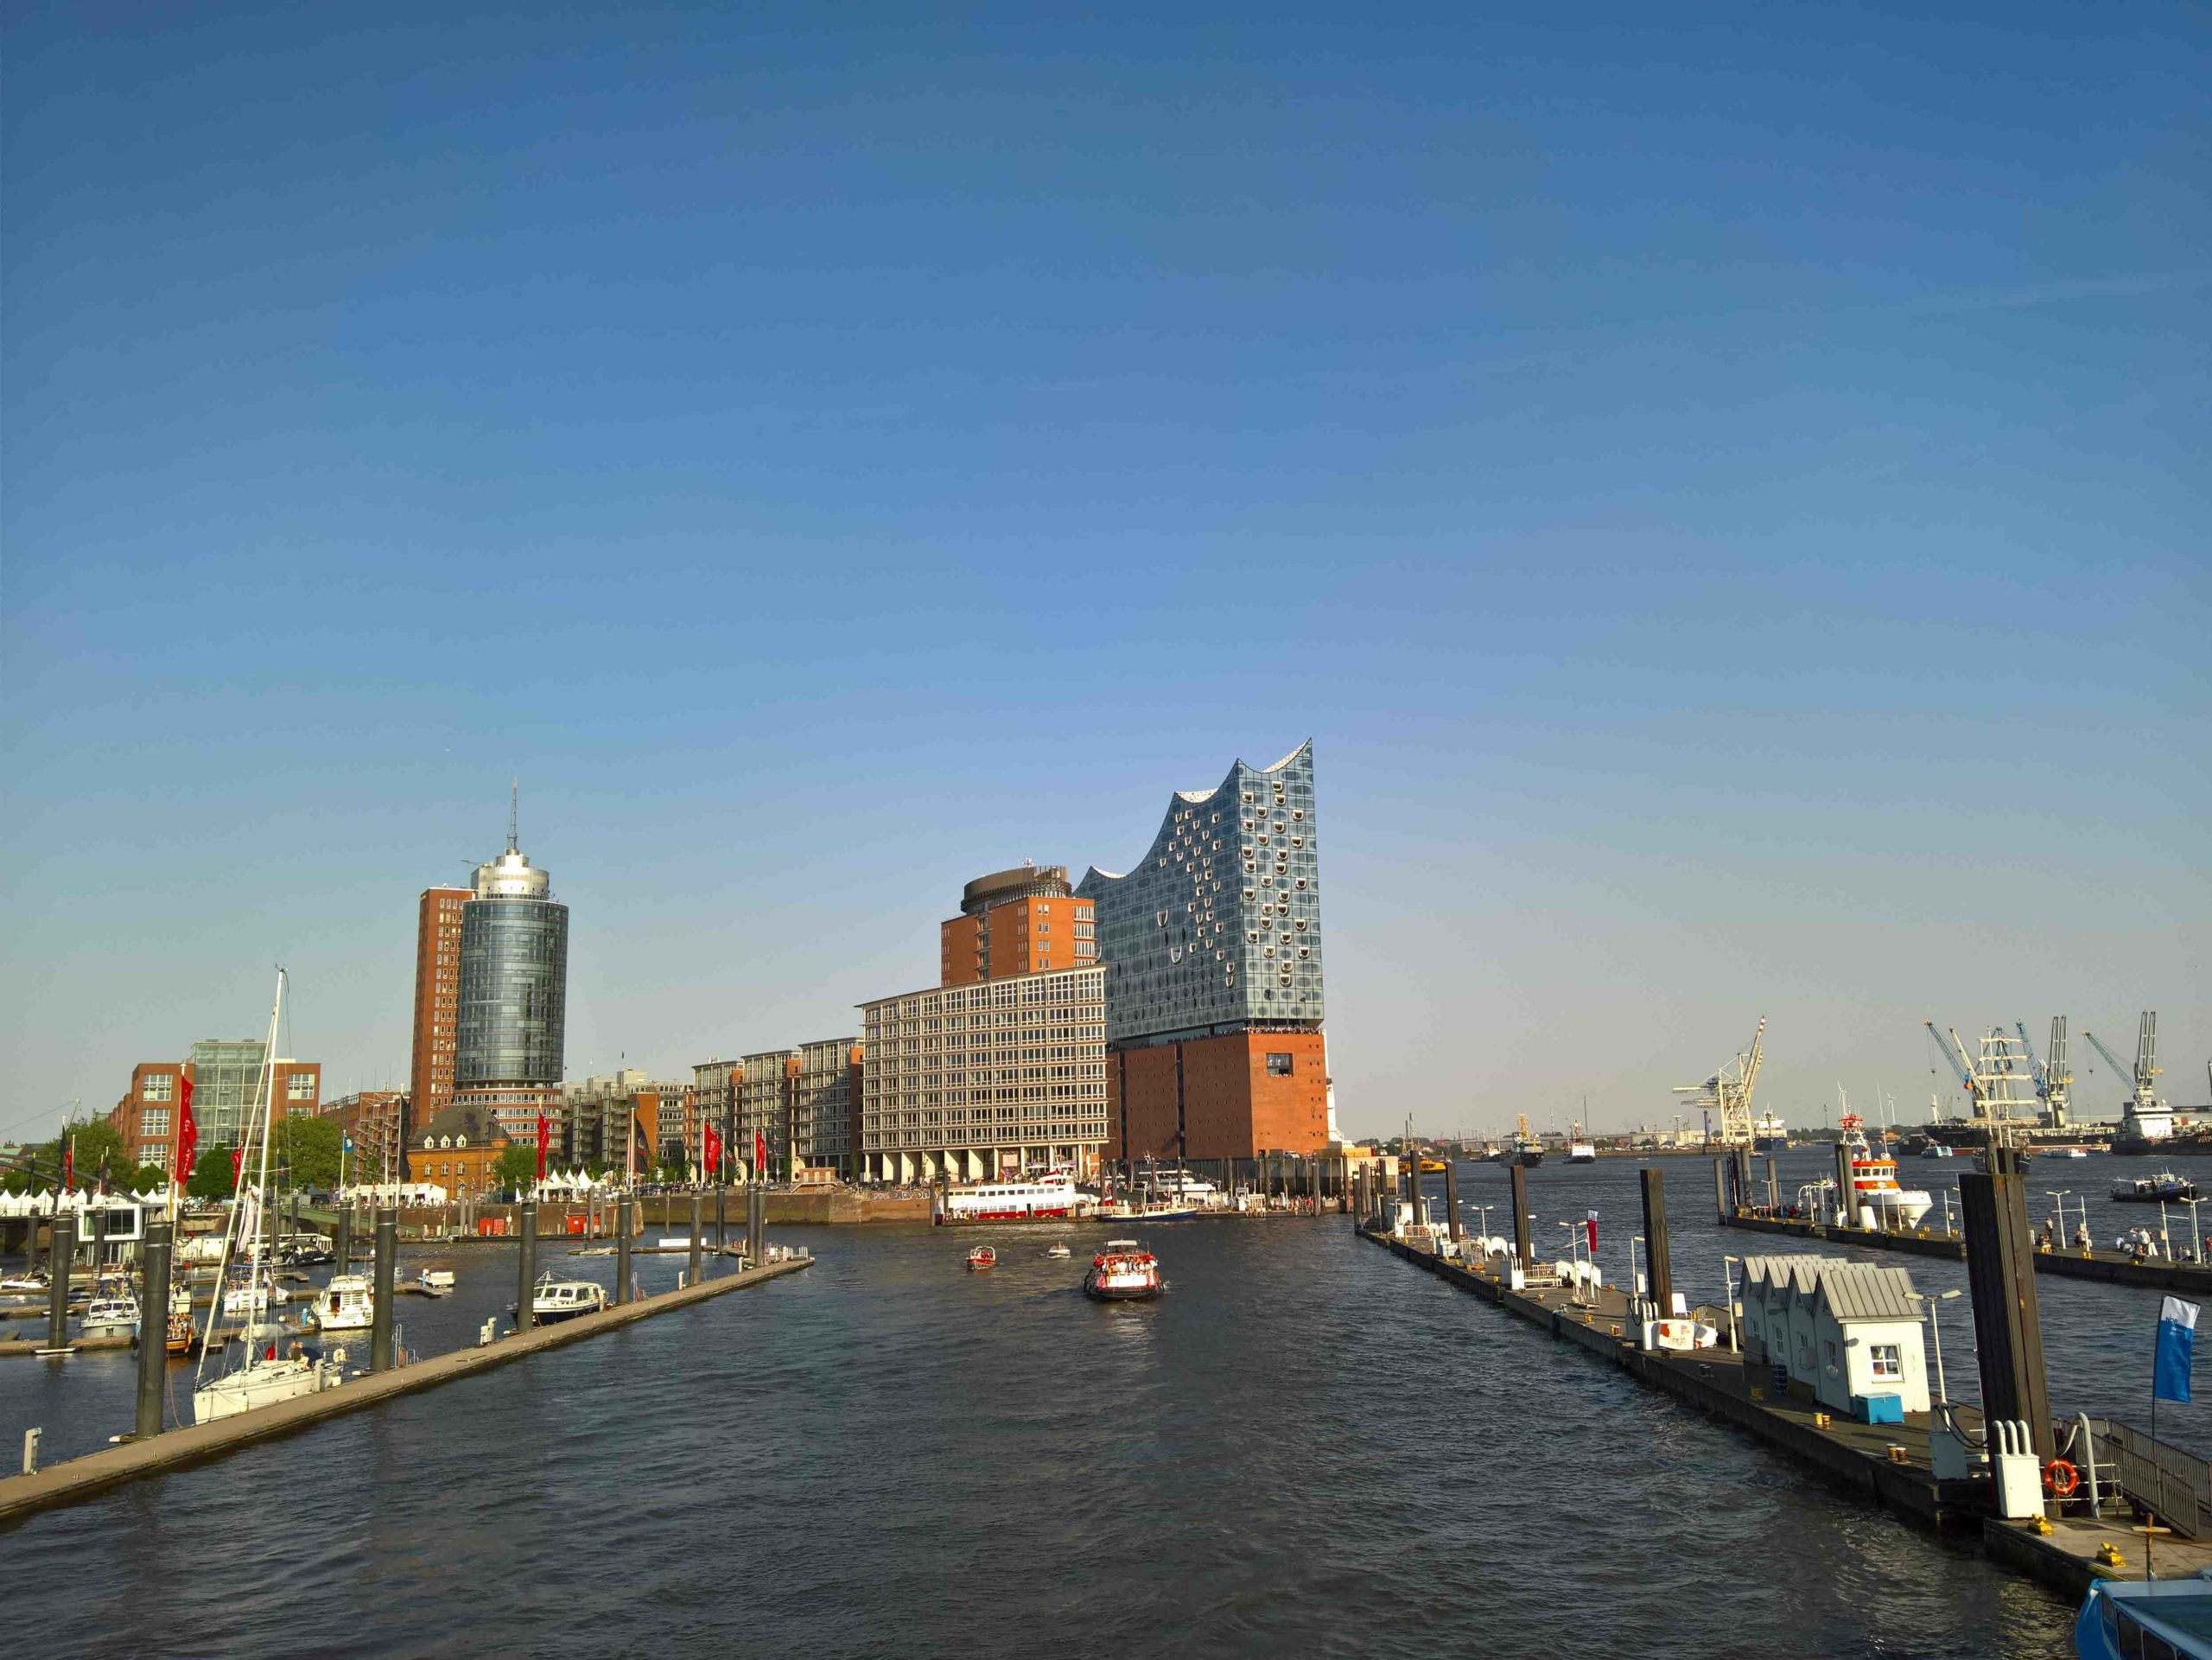 The Elbphilharmonie Hamburg